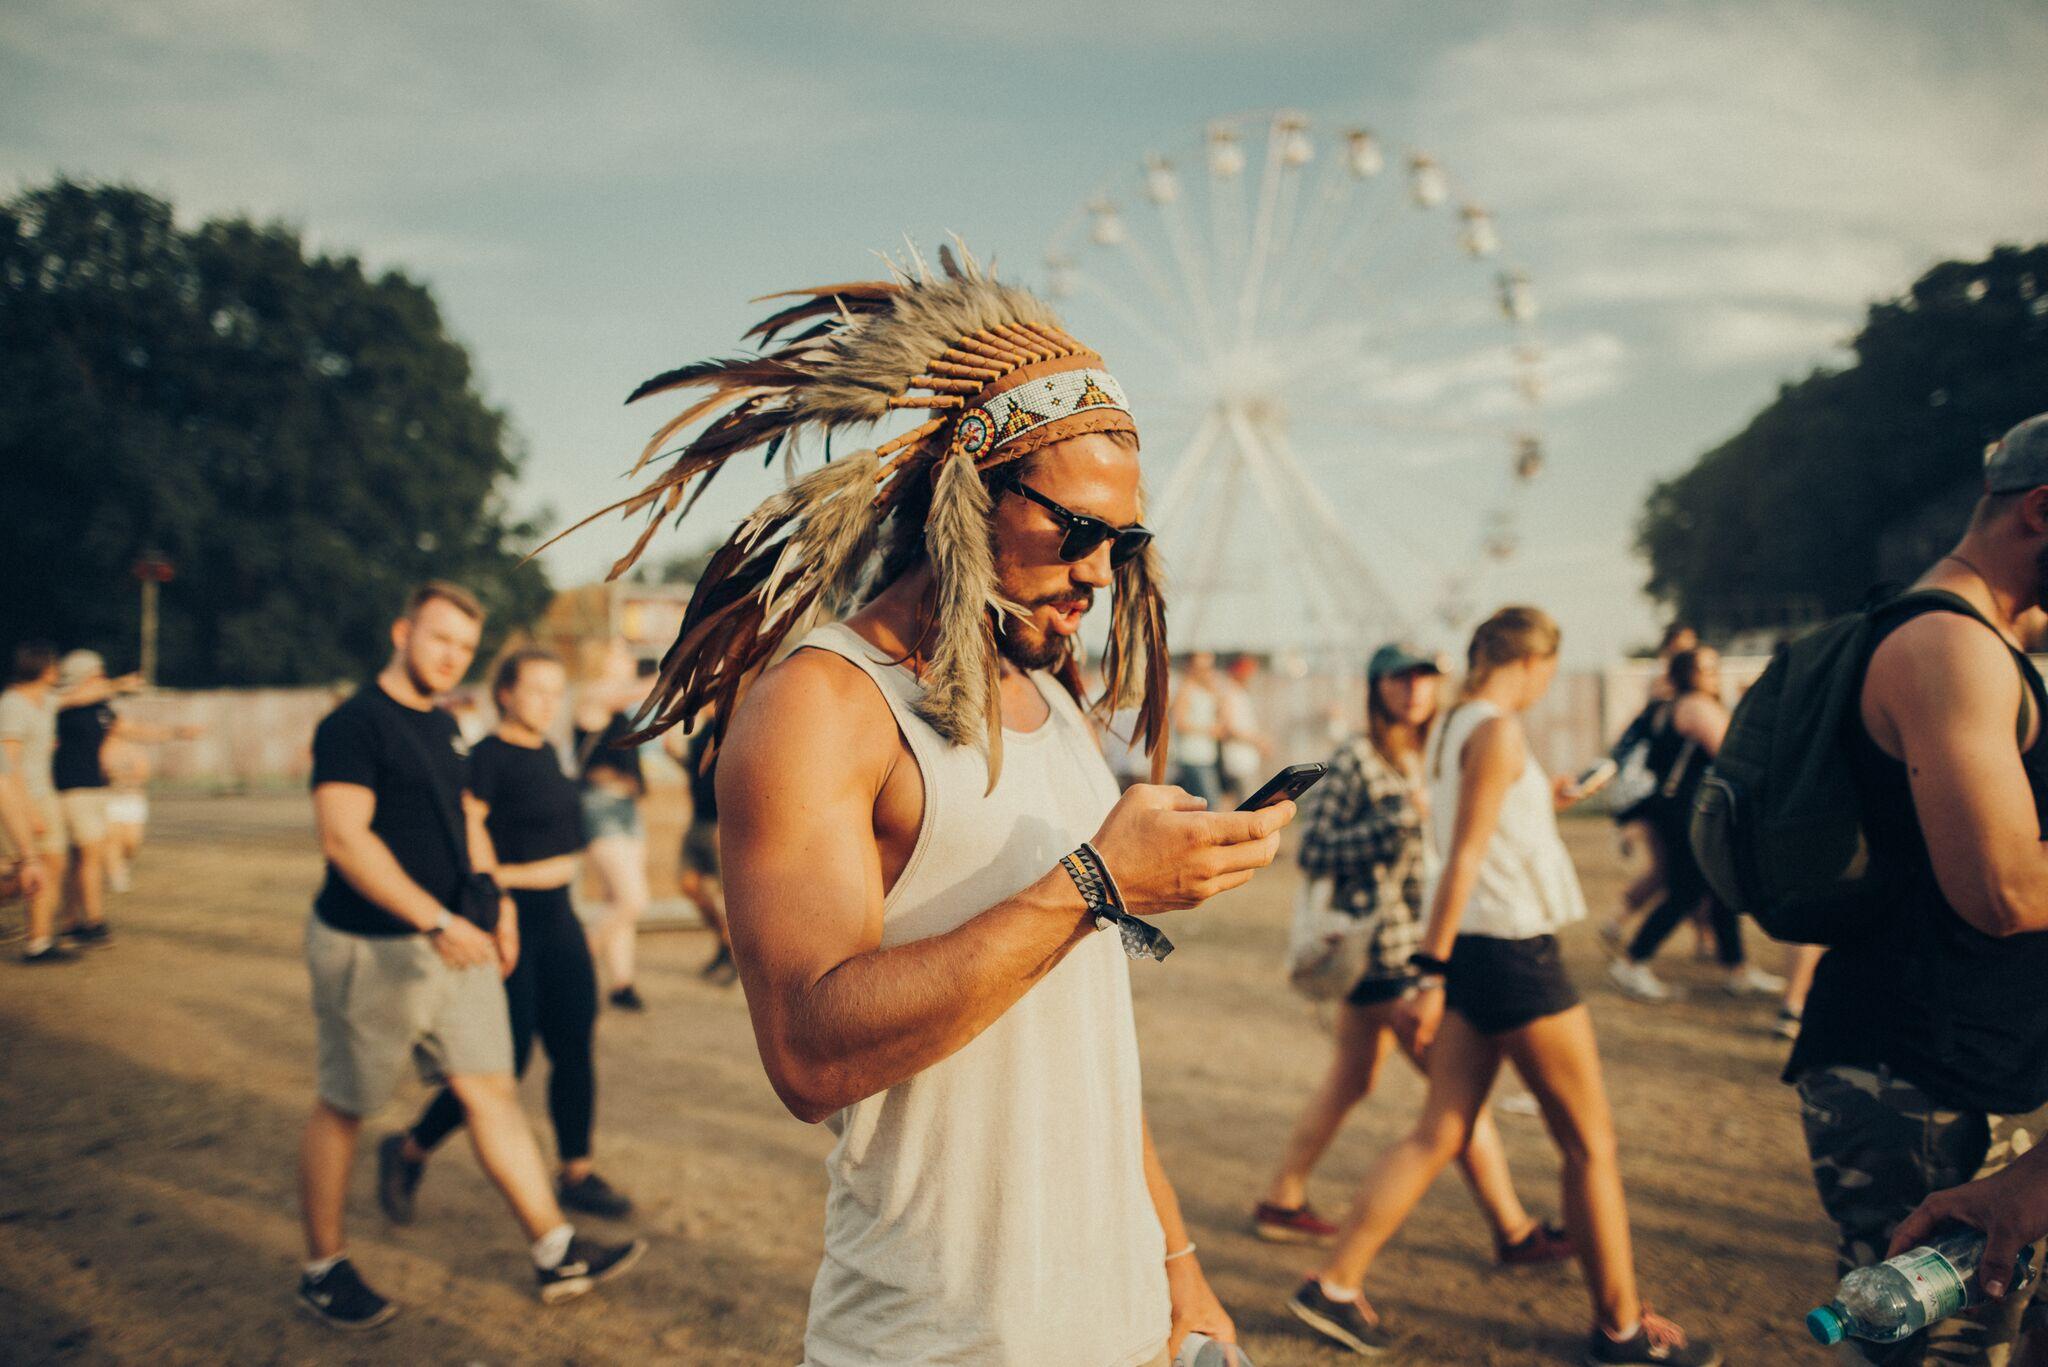 Parookaville, Parookaville 2017, EDM Festival, Electro Festival, Festival Deutschland